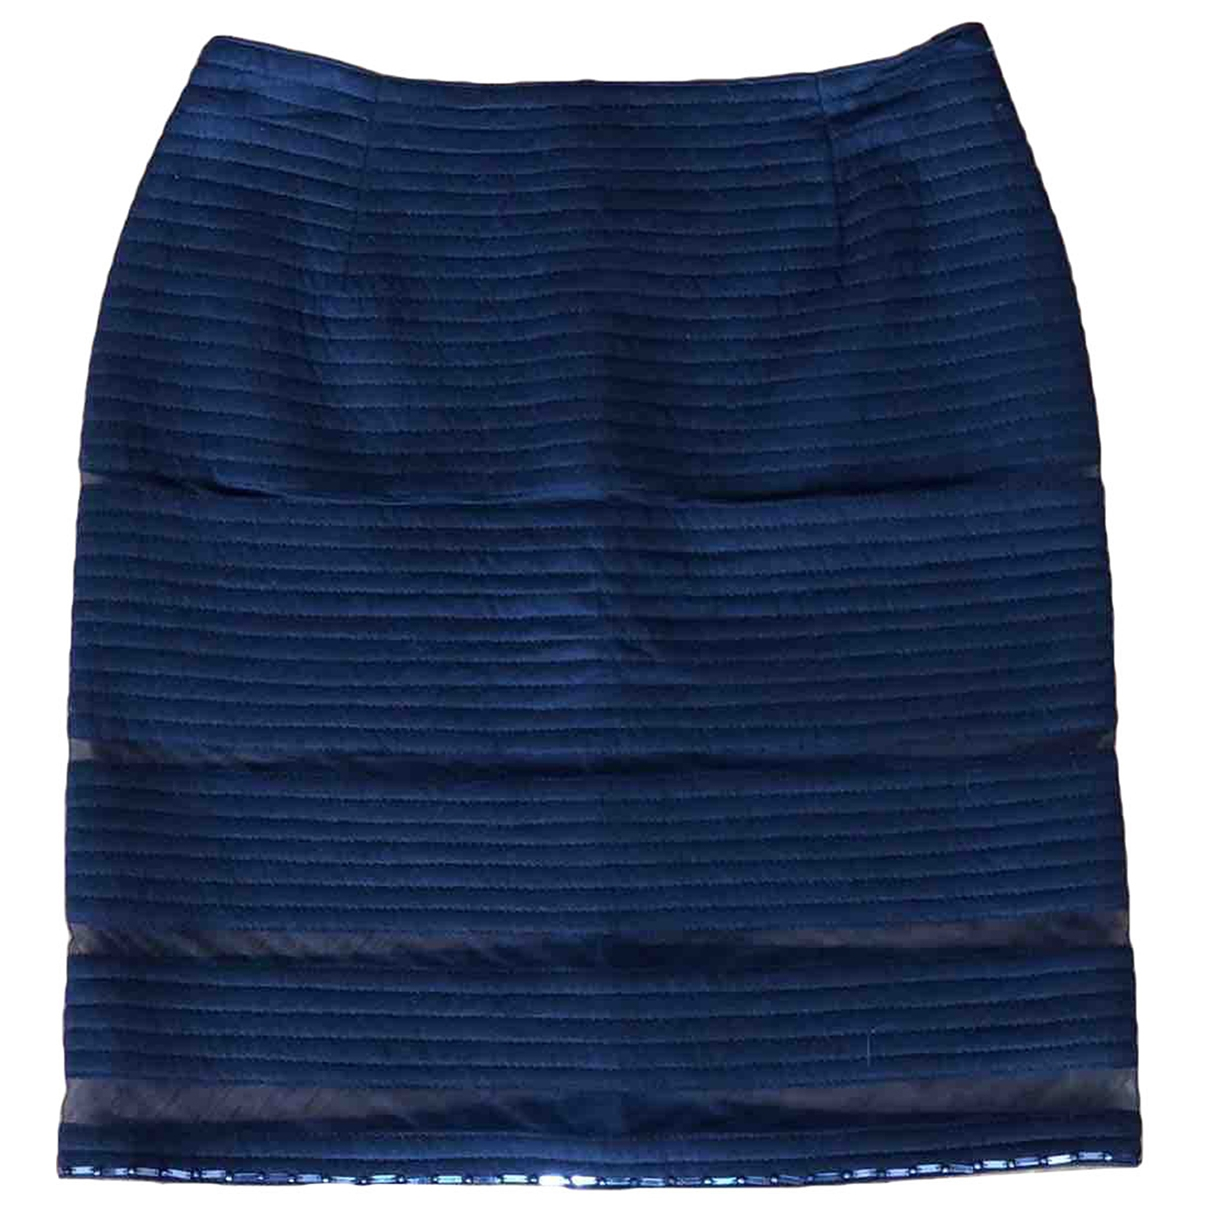 Gianni Versace \N Black Polyamide skirt for Women 38 IT